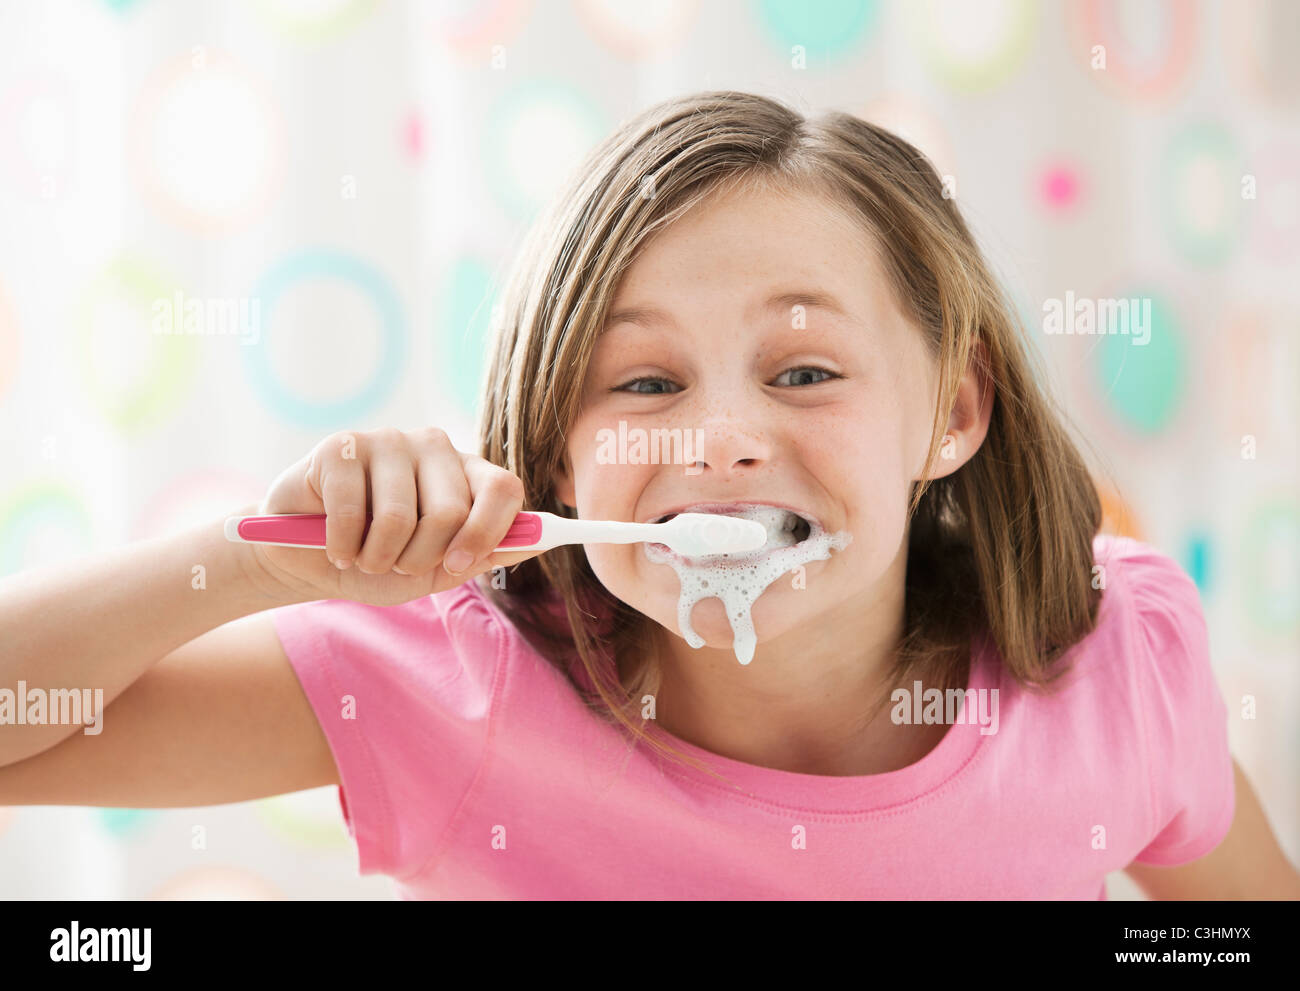 Girl (10-11) brushing teeth in messy way - Stock Image